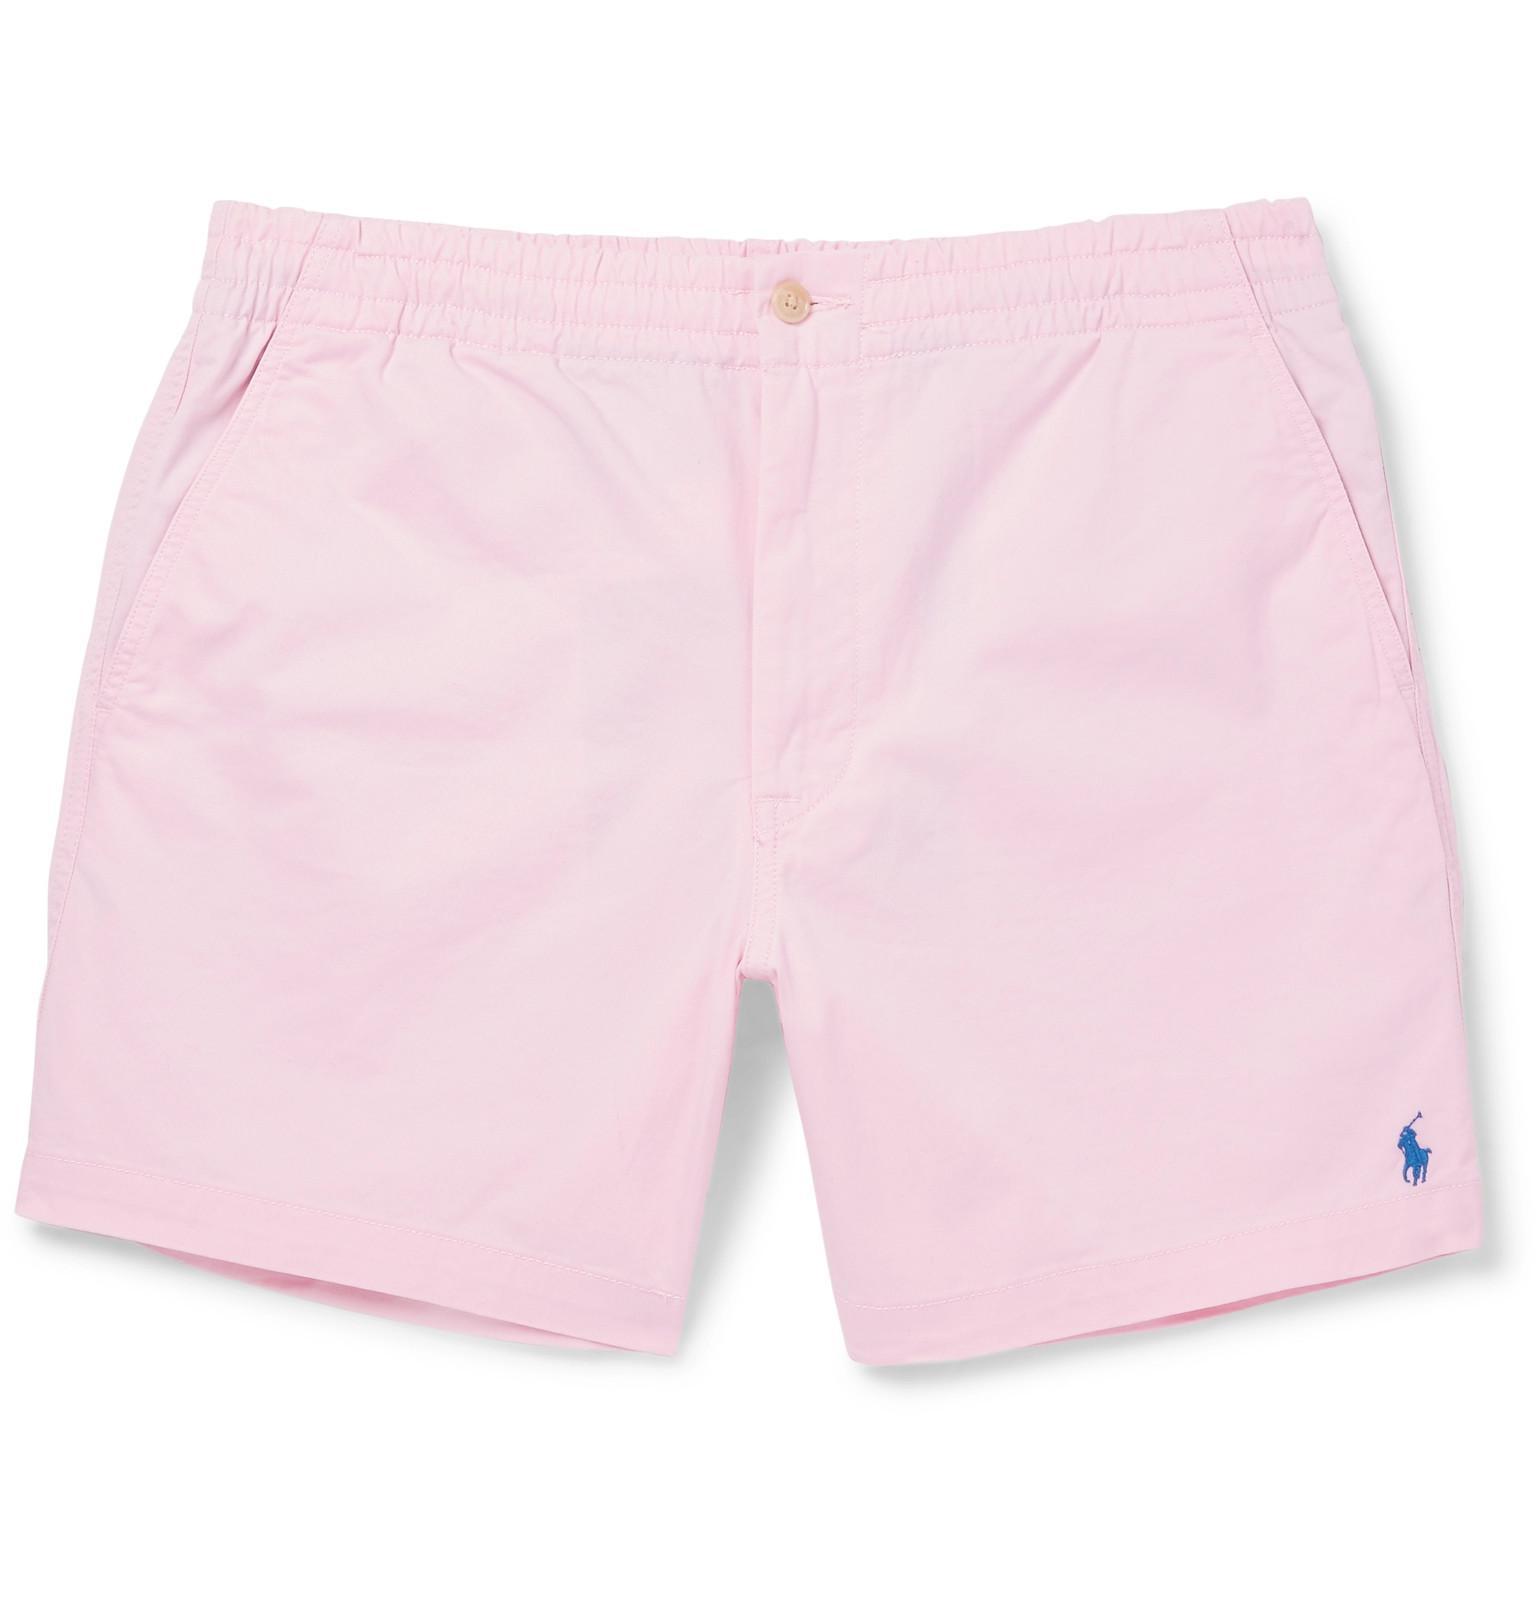 Prepster Stretch-cotton Twill Shorts Polo Ralph Lauren nOvzpwO19